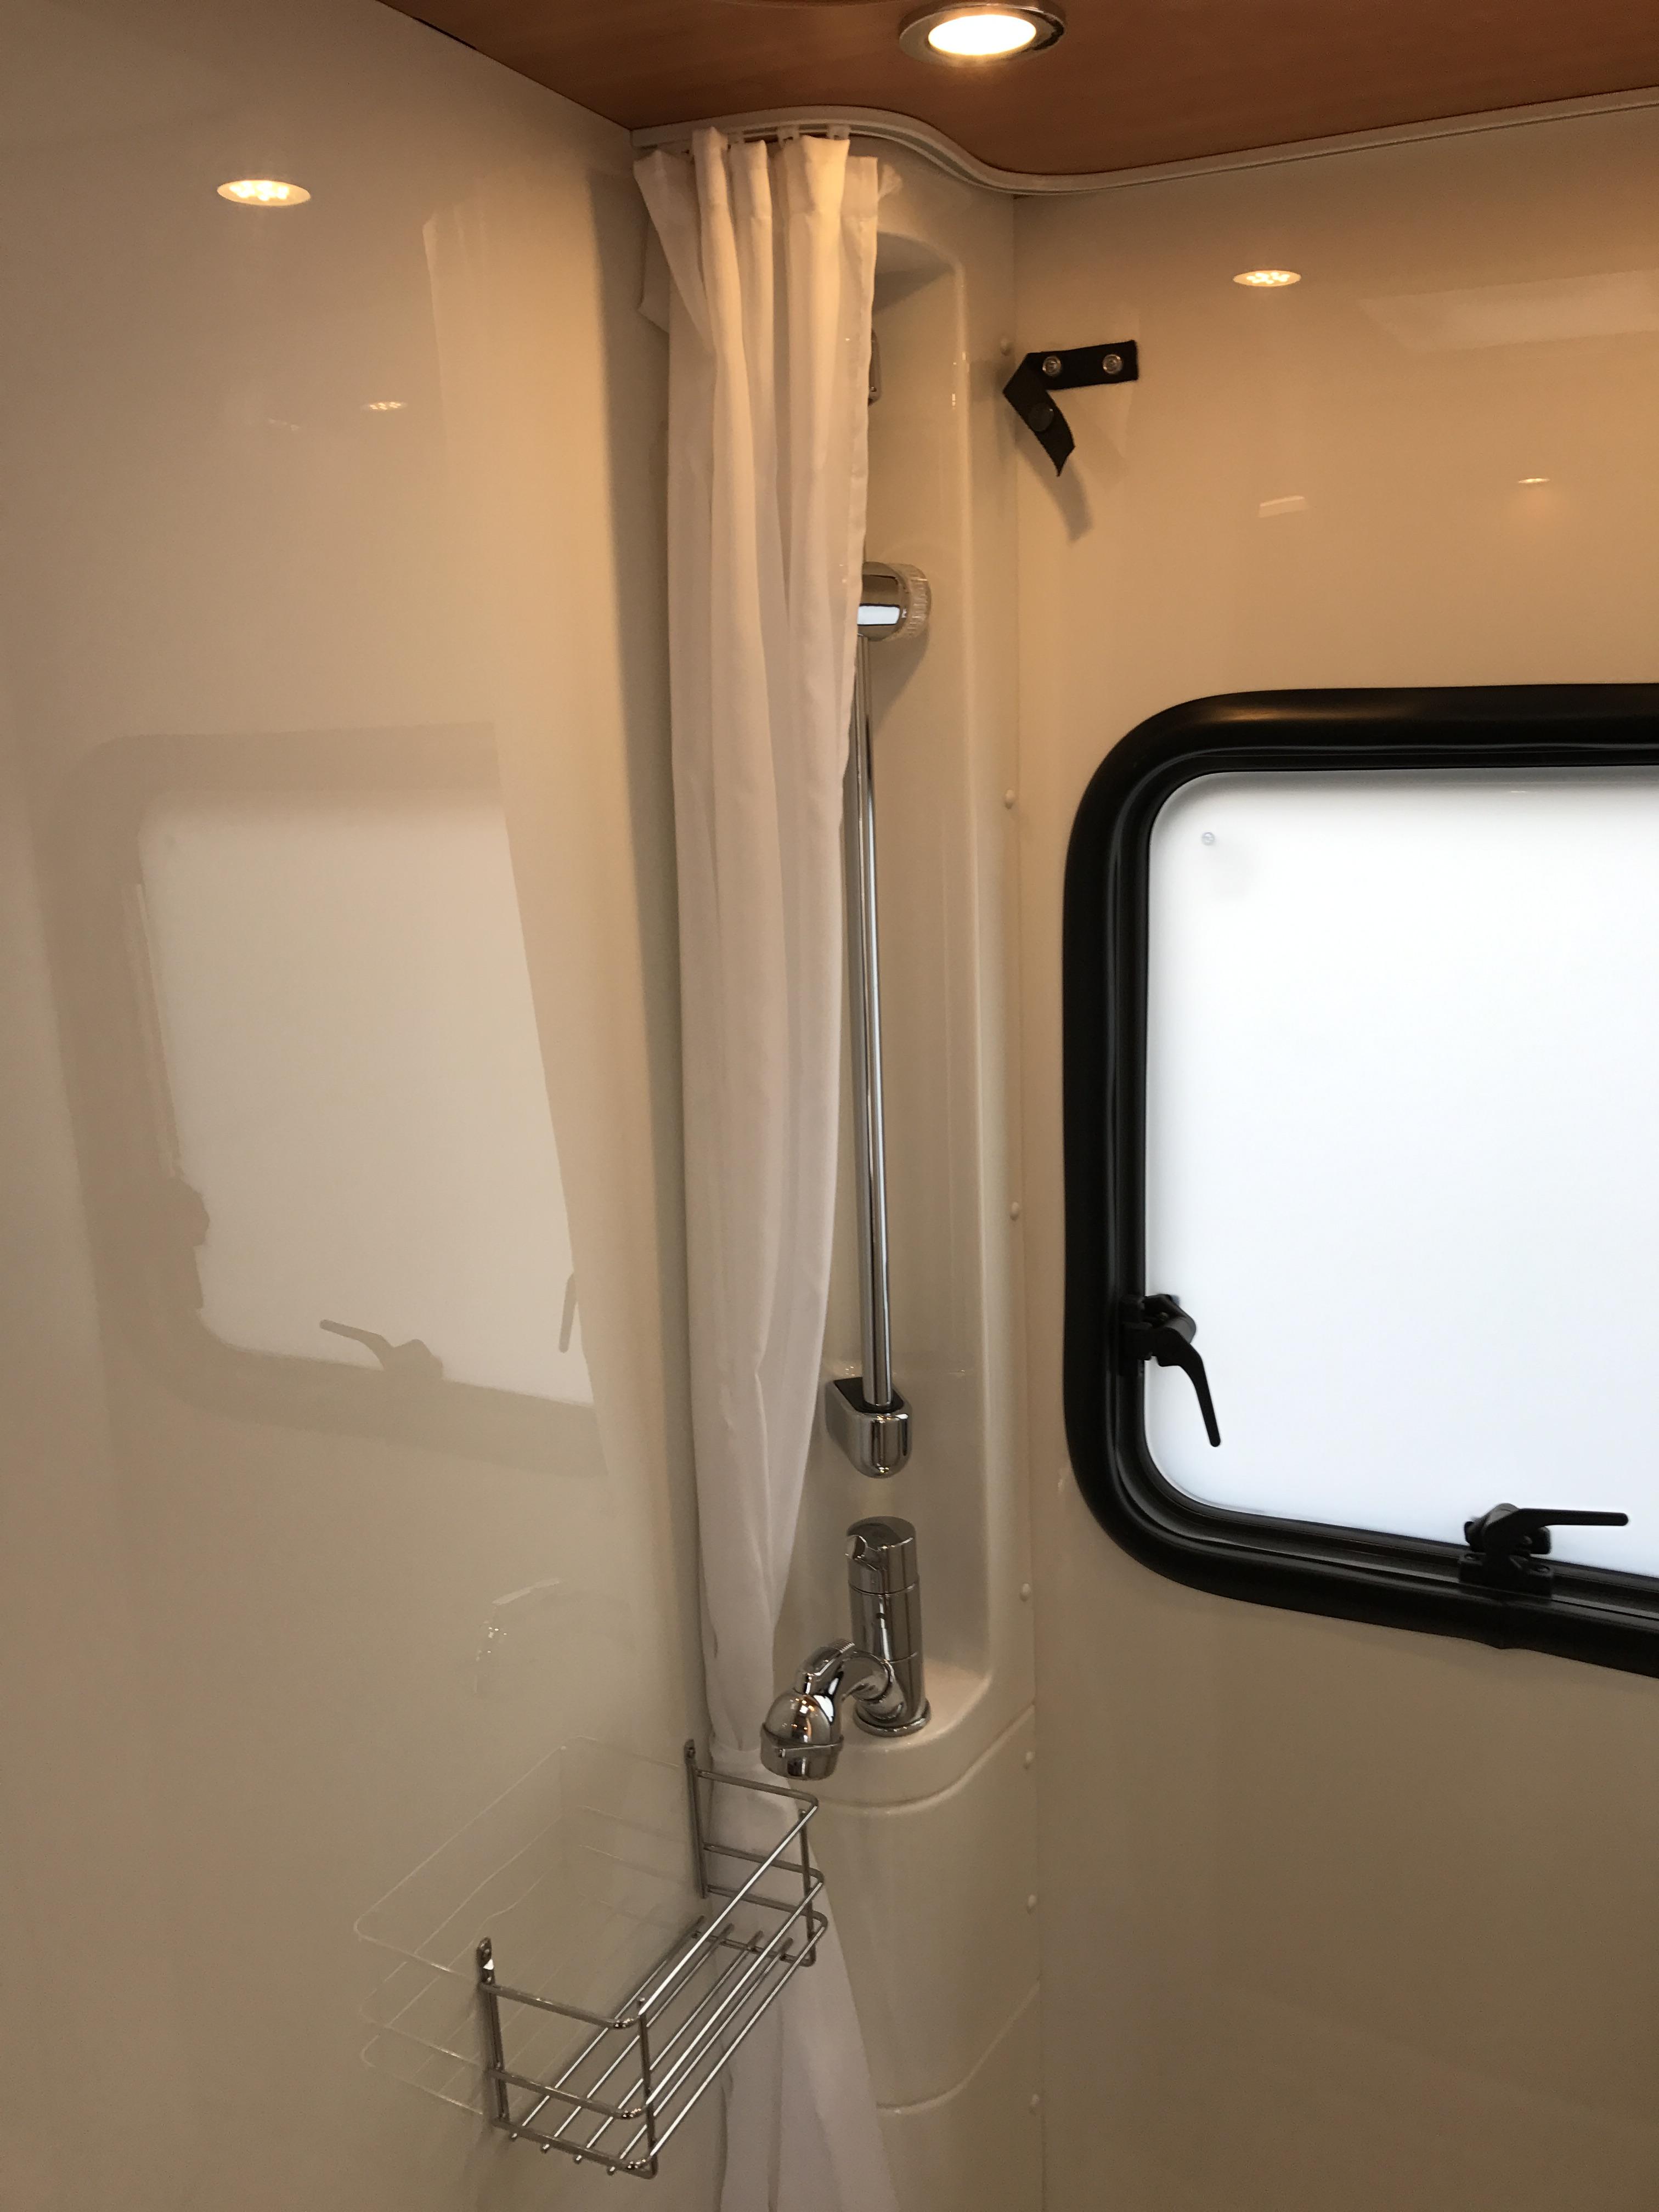 Globebus T4 Automaat Active toiletruimte